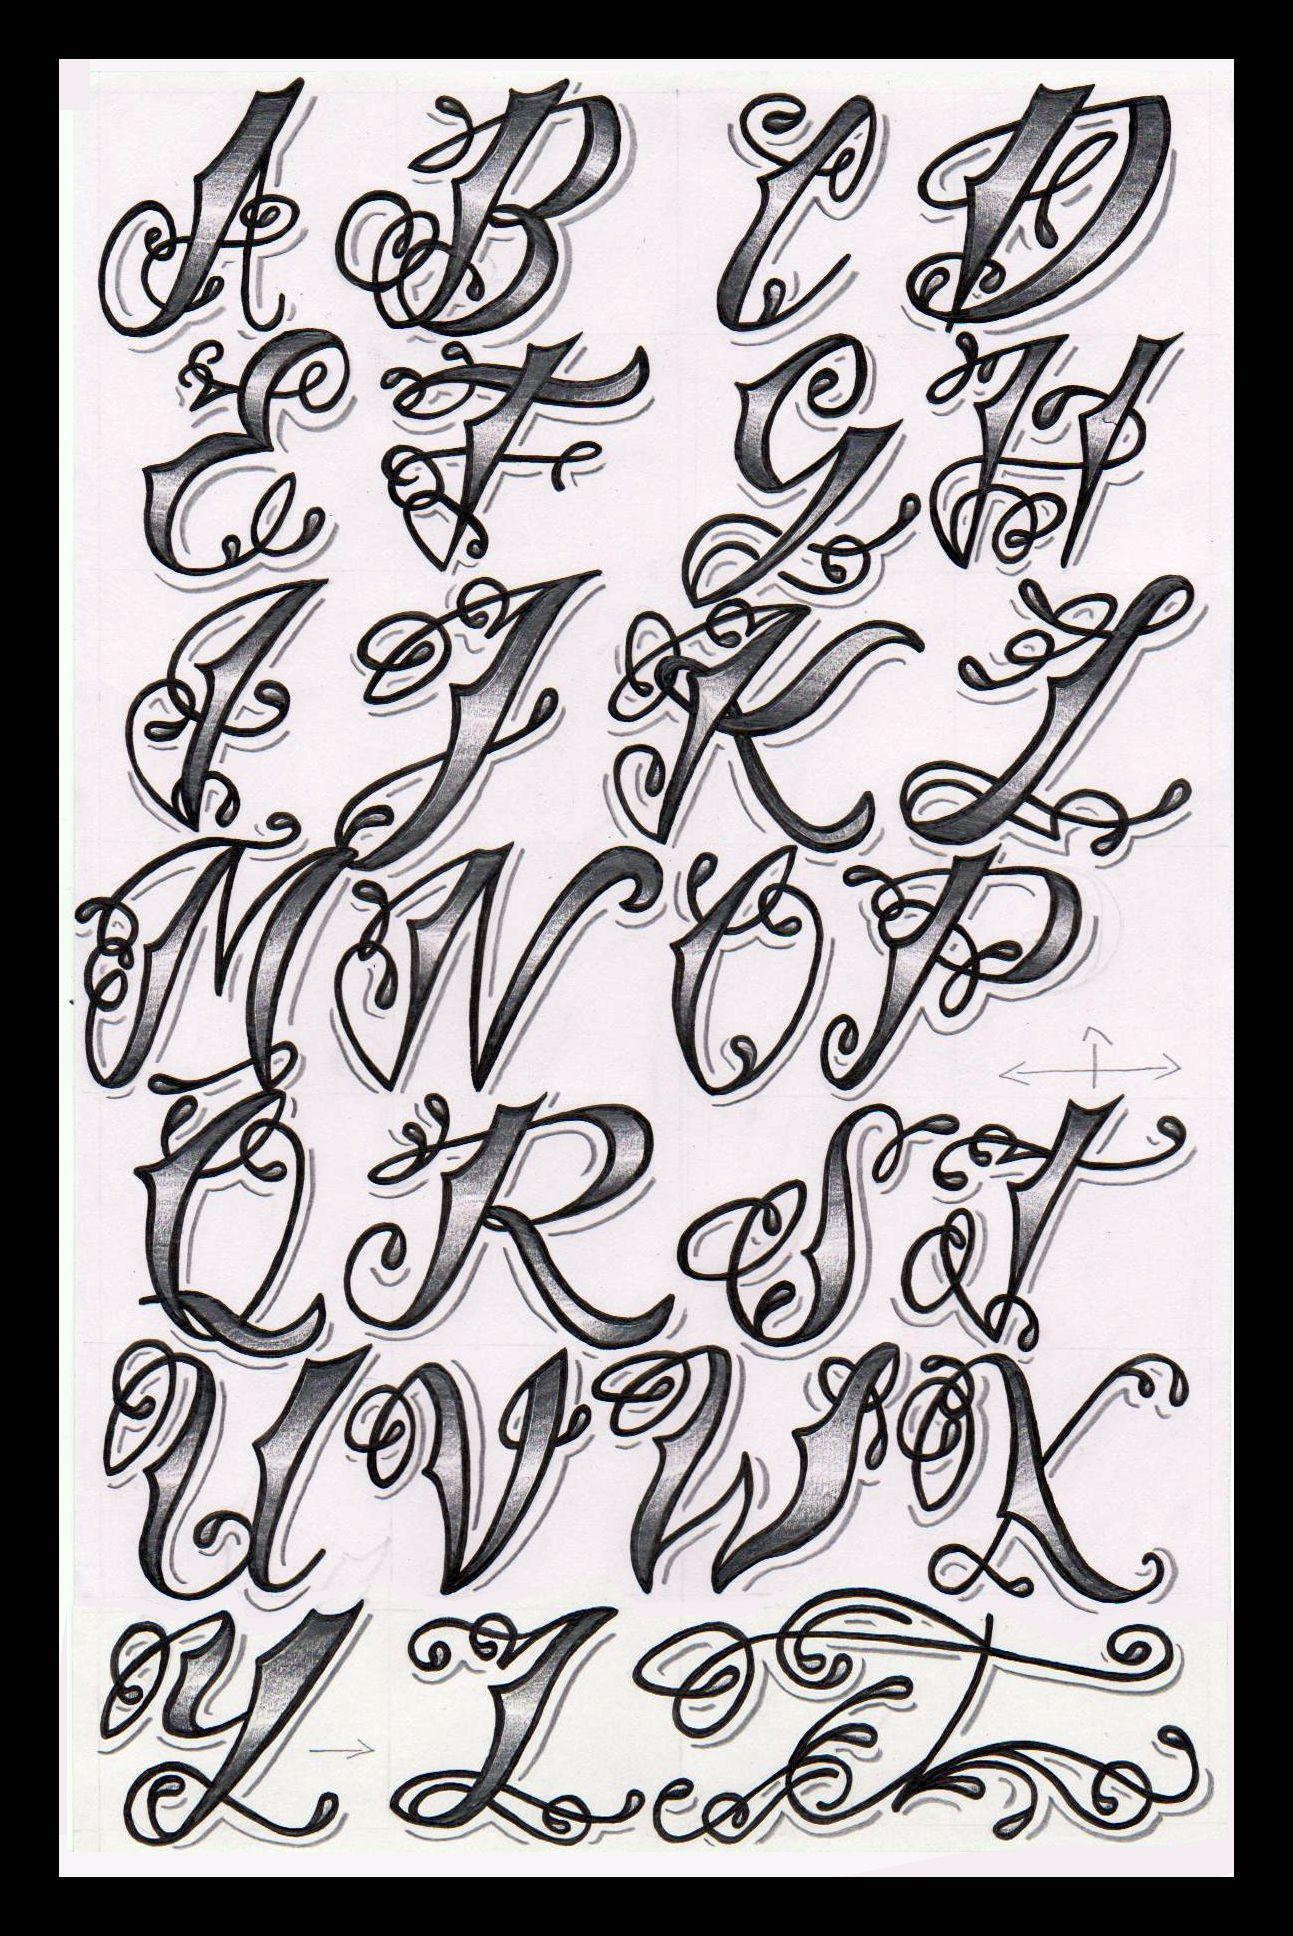 Cholo Tattoo Alphabet | Flickr - Photo Sharing!